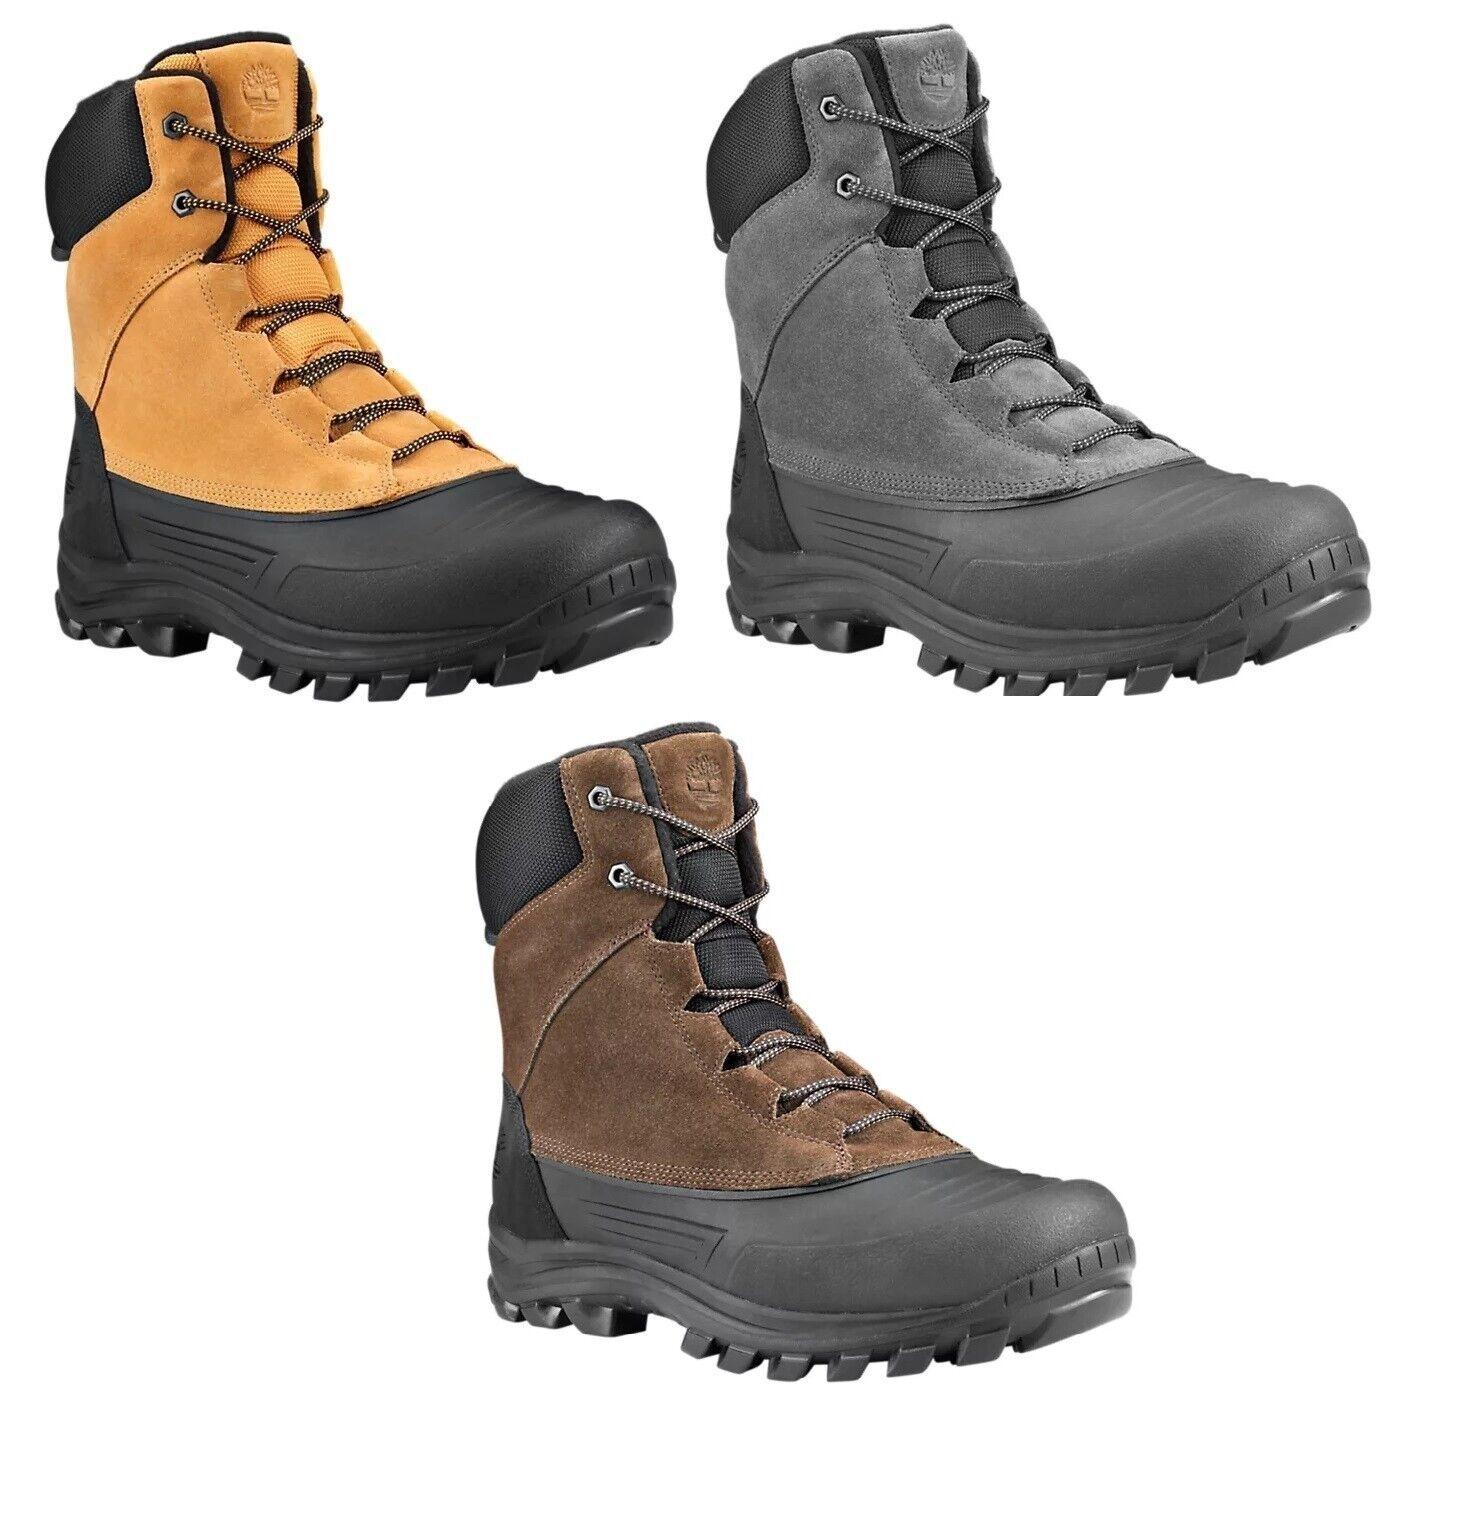 Timberland Mens Snowblades Winter Duck Snow Boots Wheat Beige Black Gray